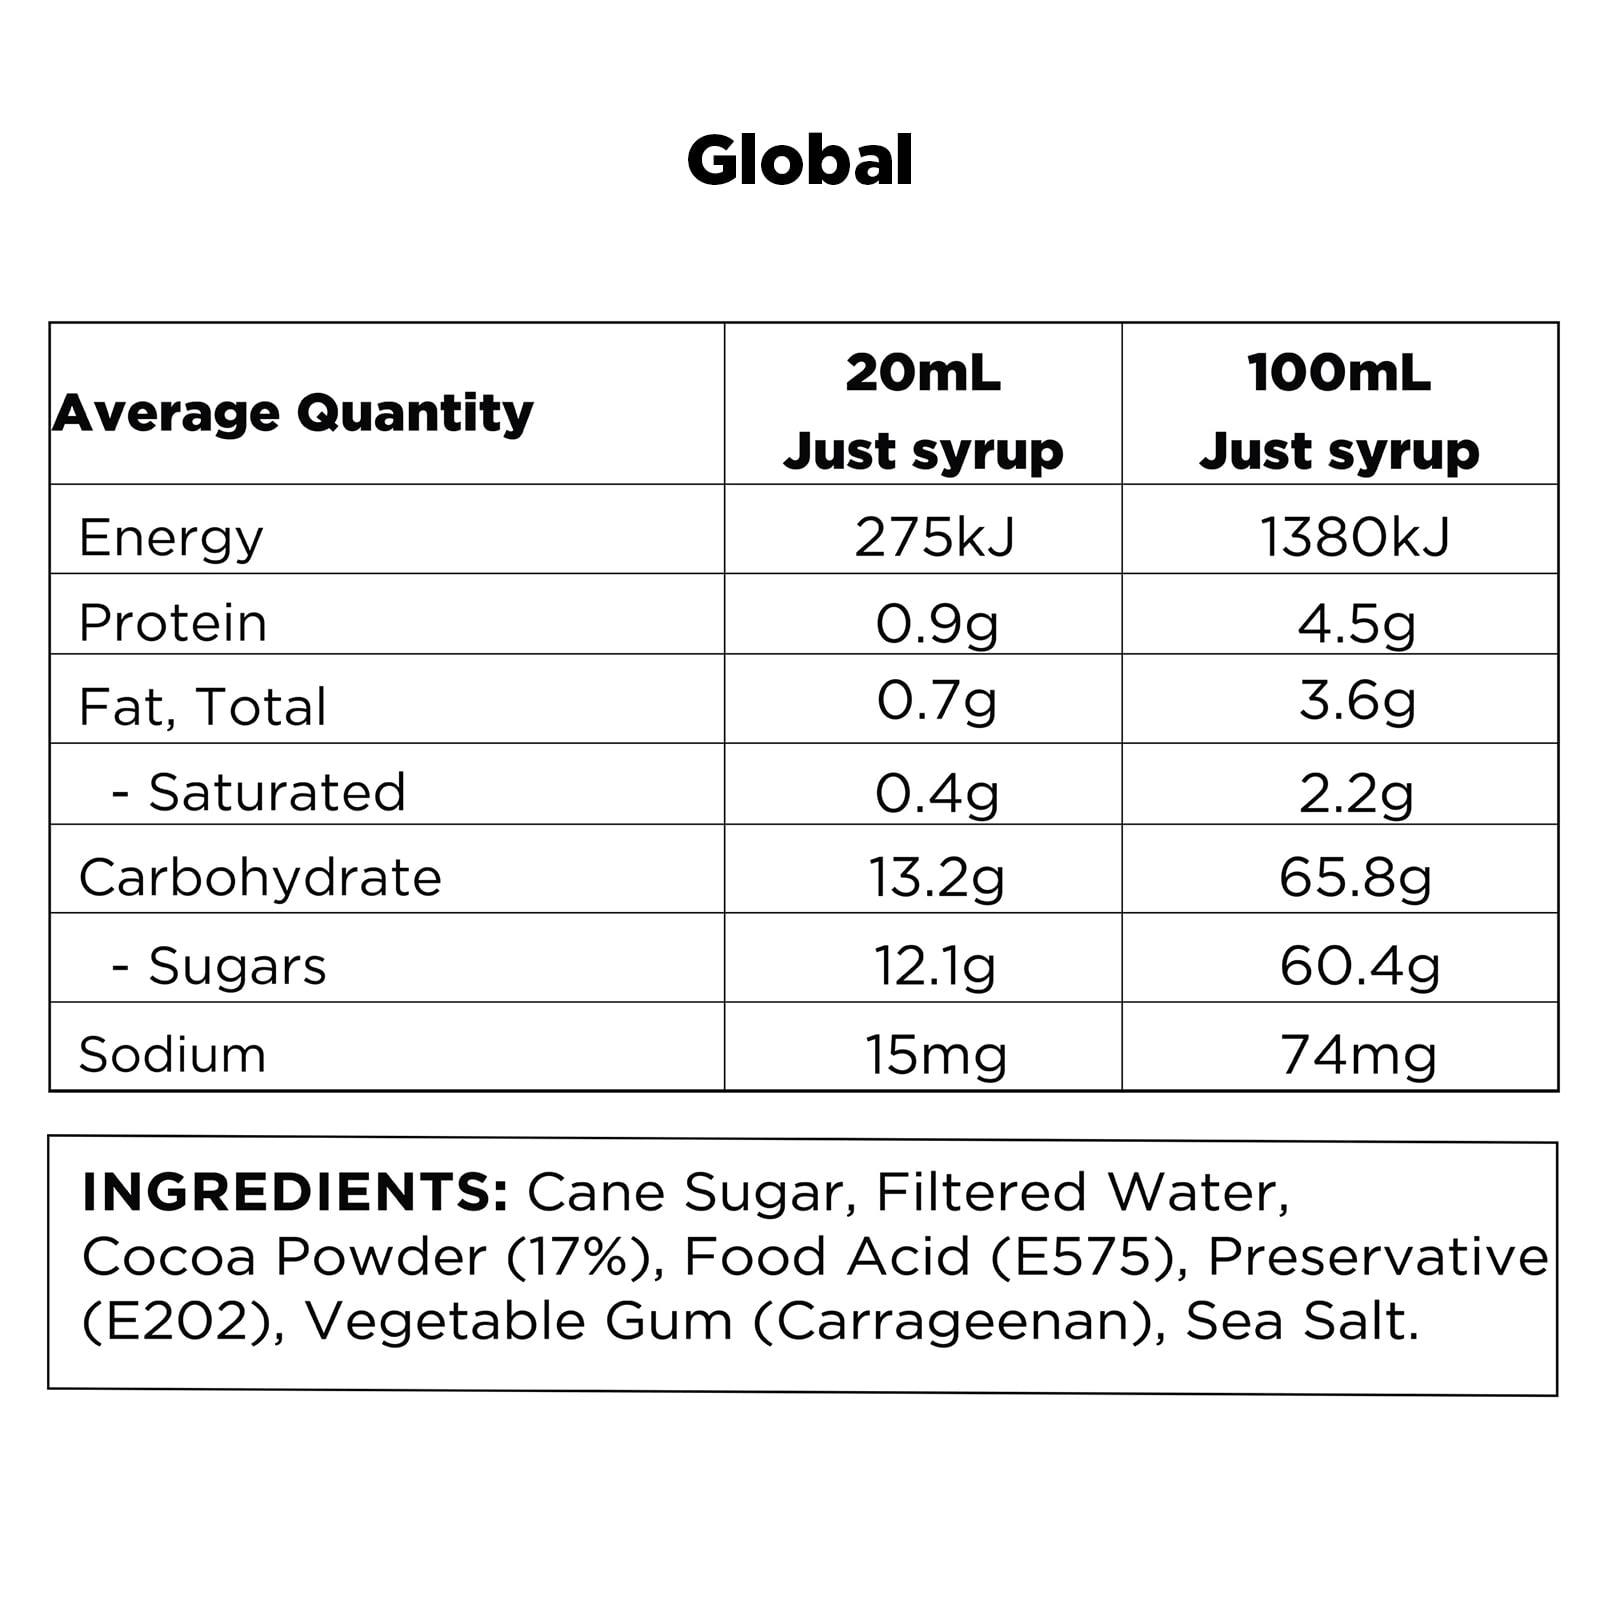 Q Mint Hot Chocolate Global